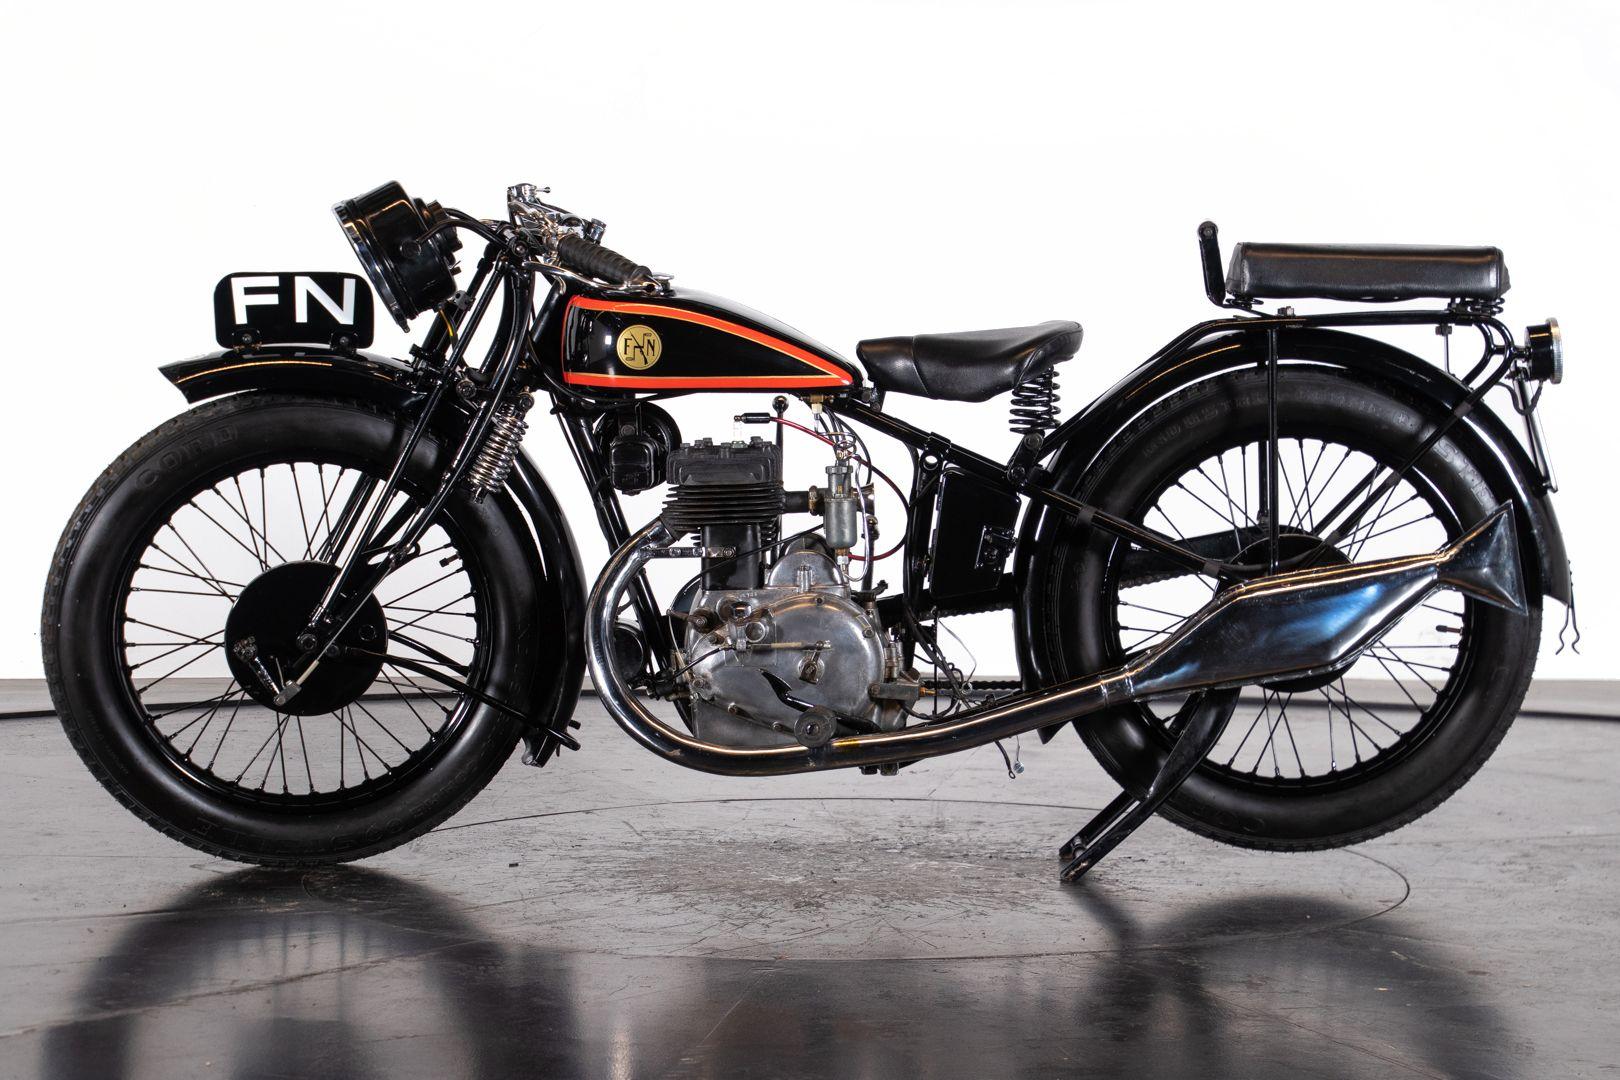 1935 FN 350 55954